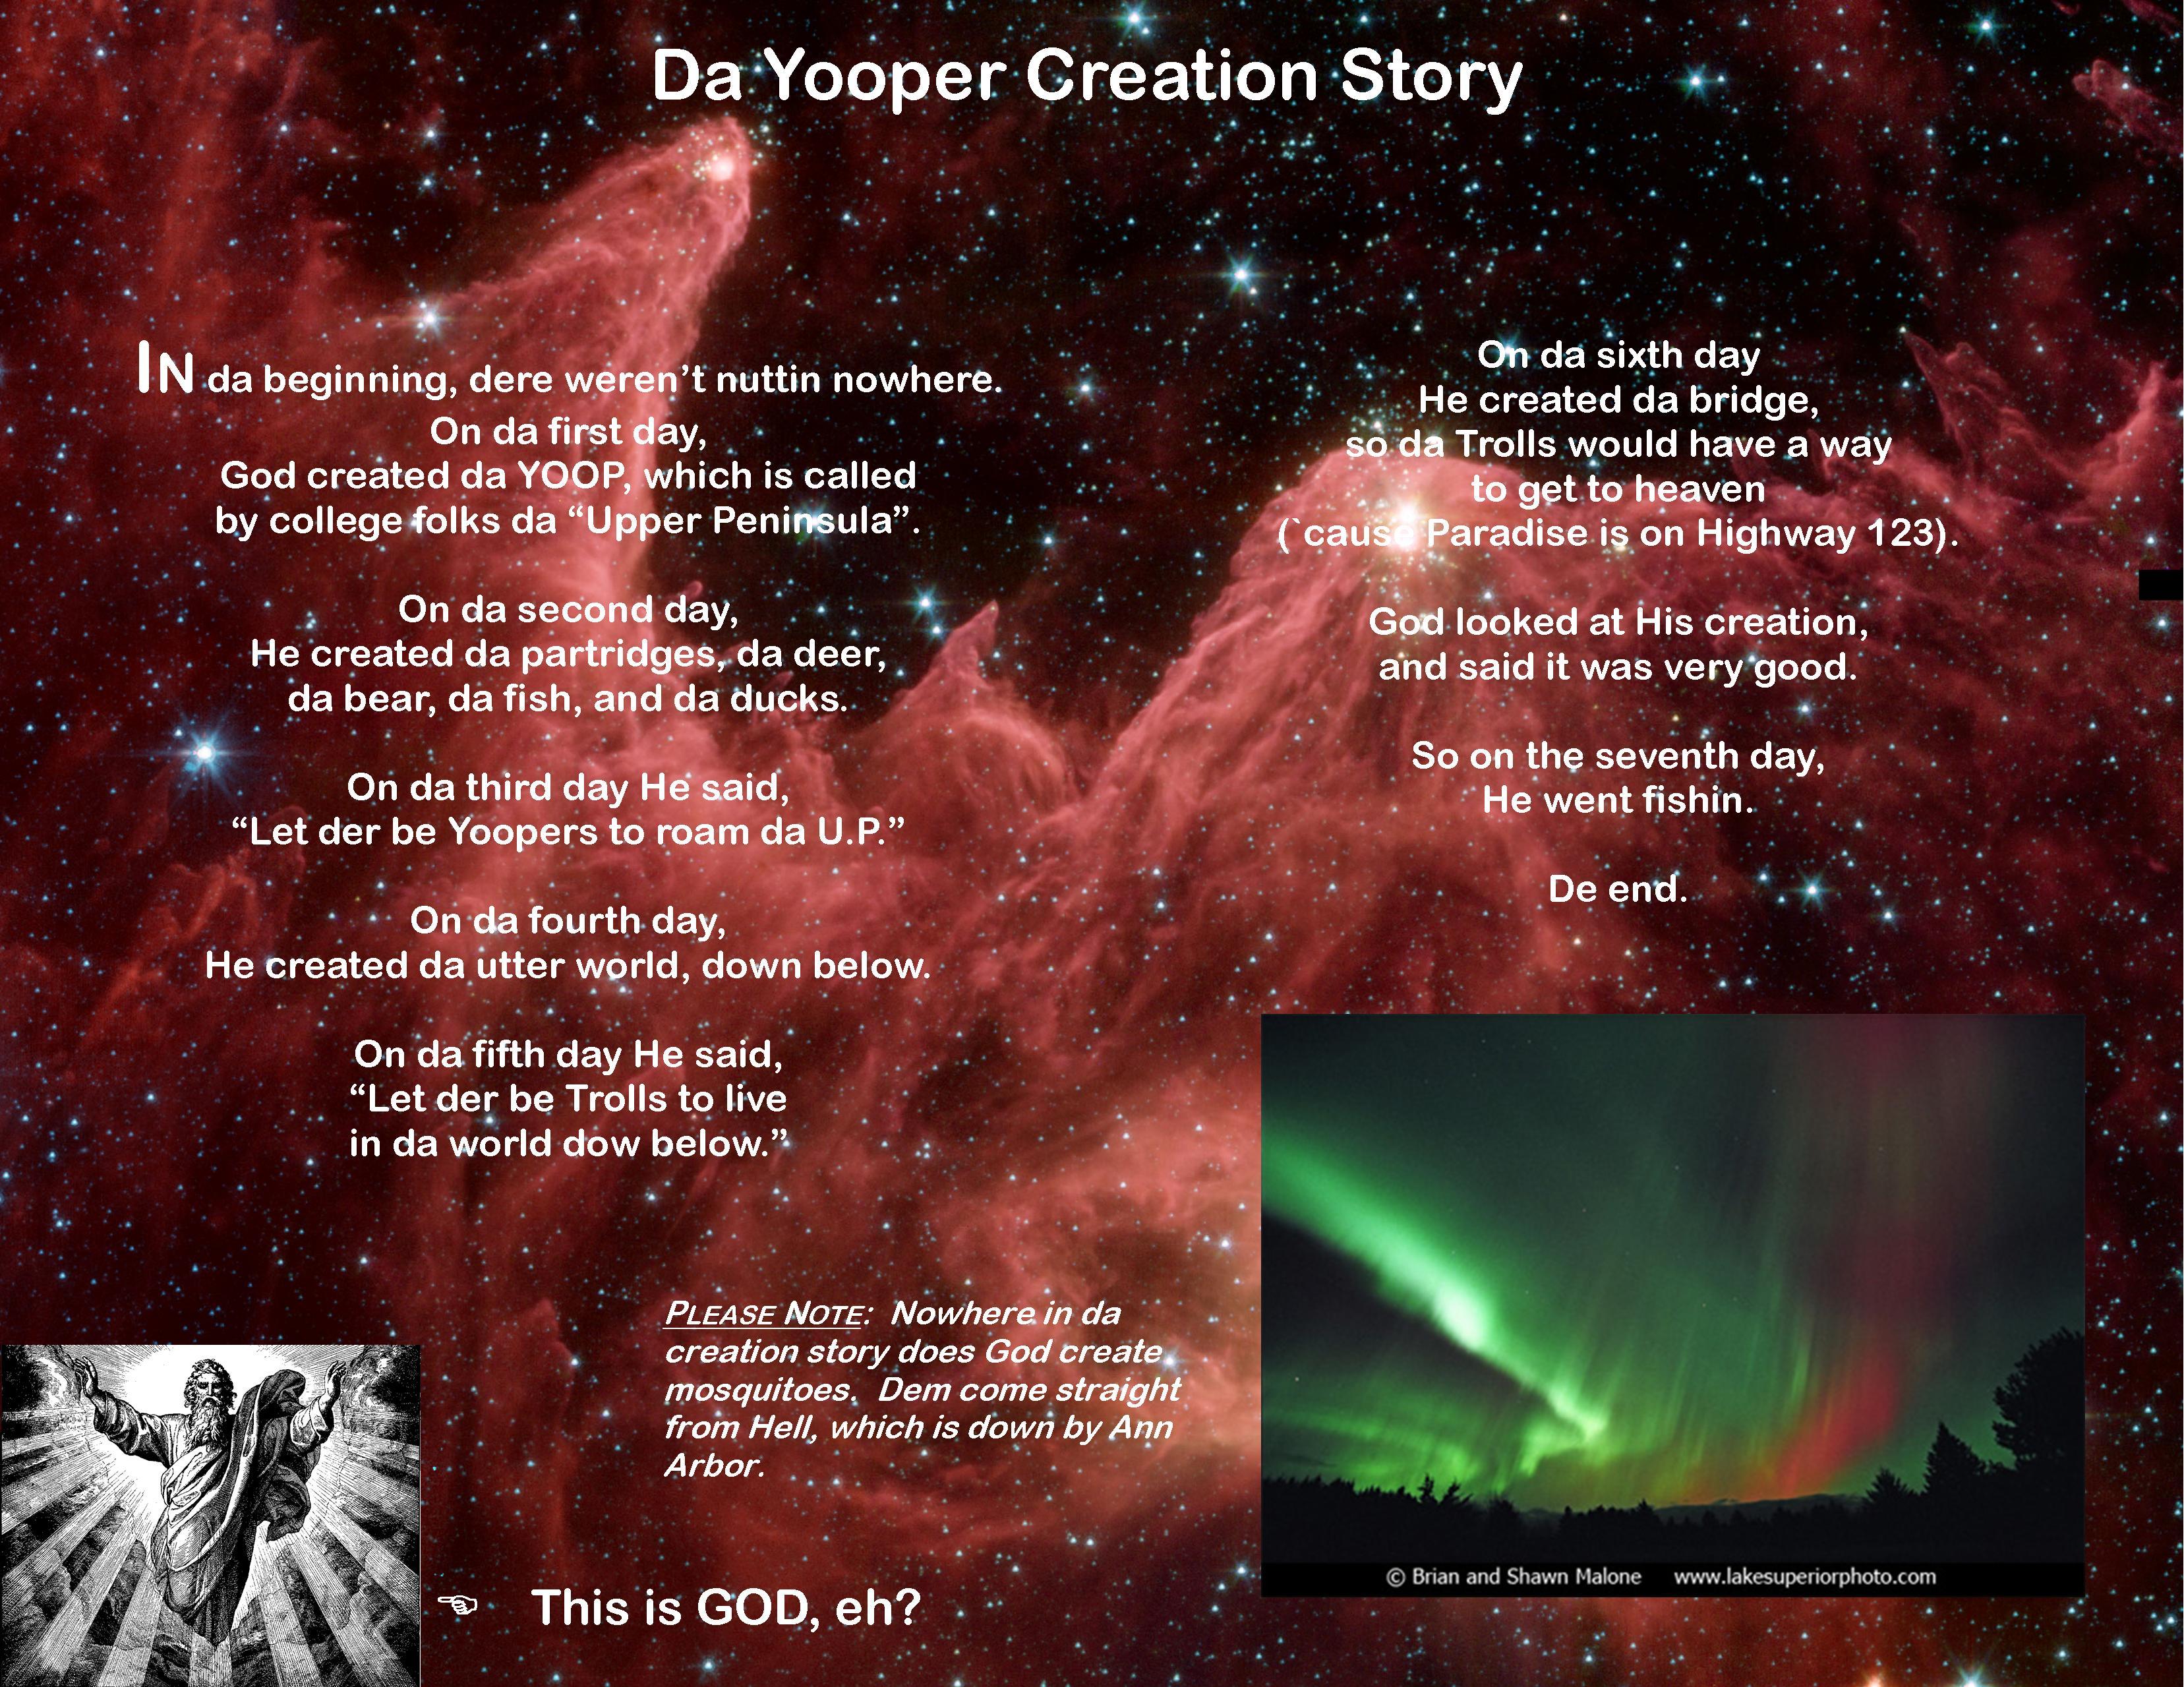 yooper creation story by regklubeck on deviantart